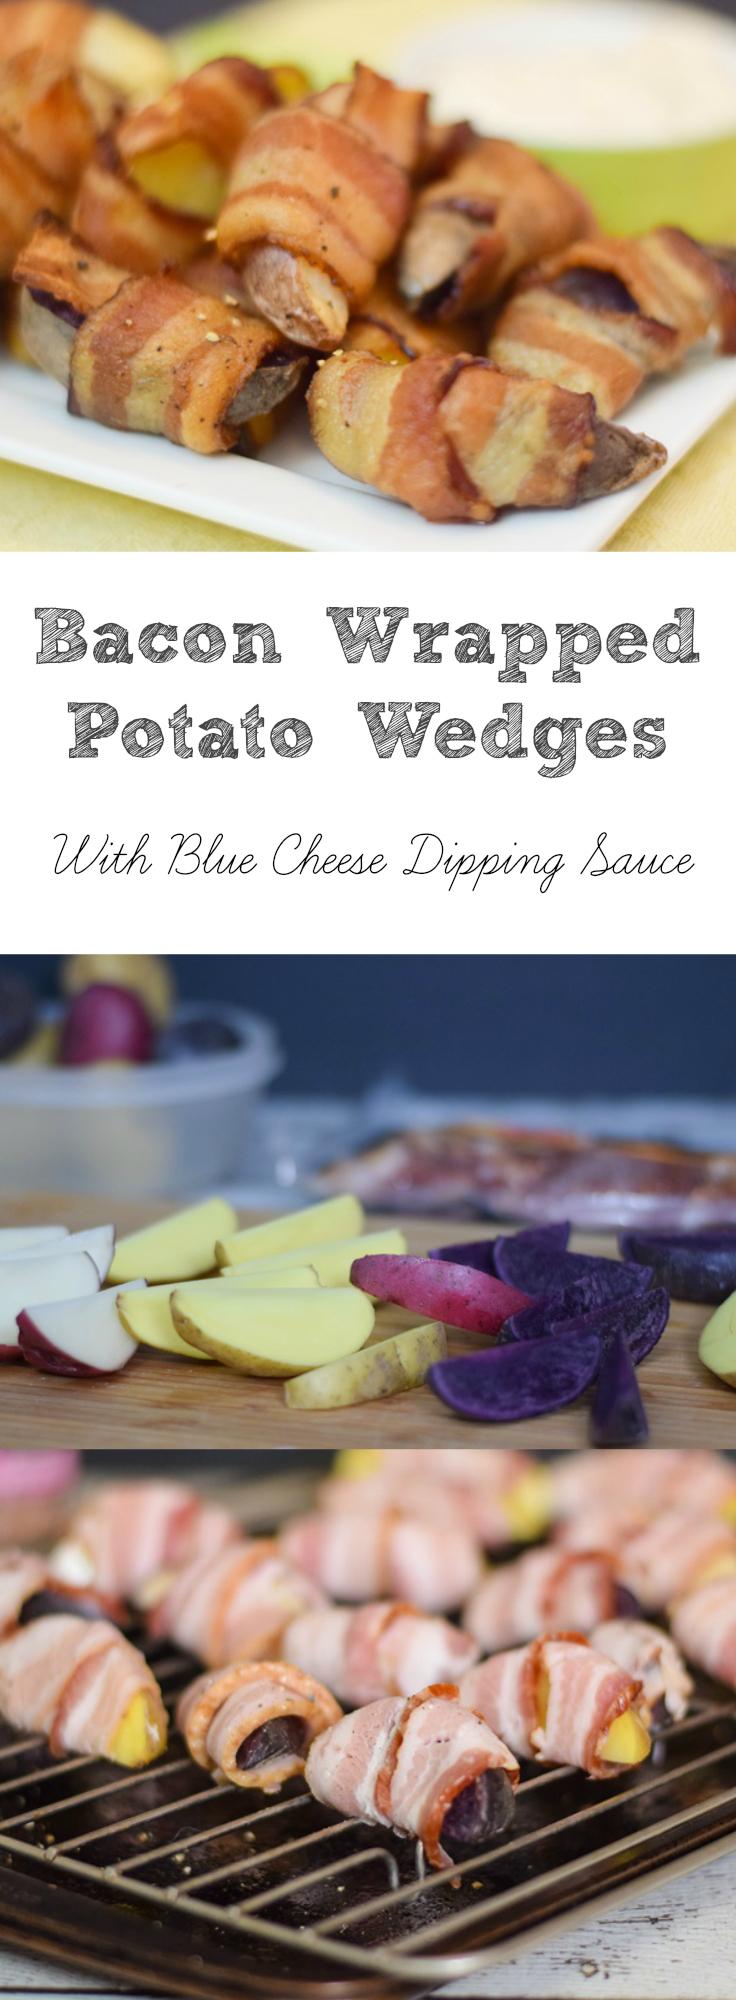 Bacon Wrapped Potato Wedges